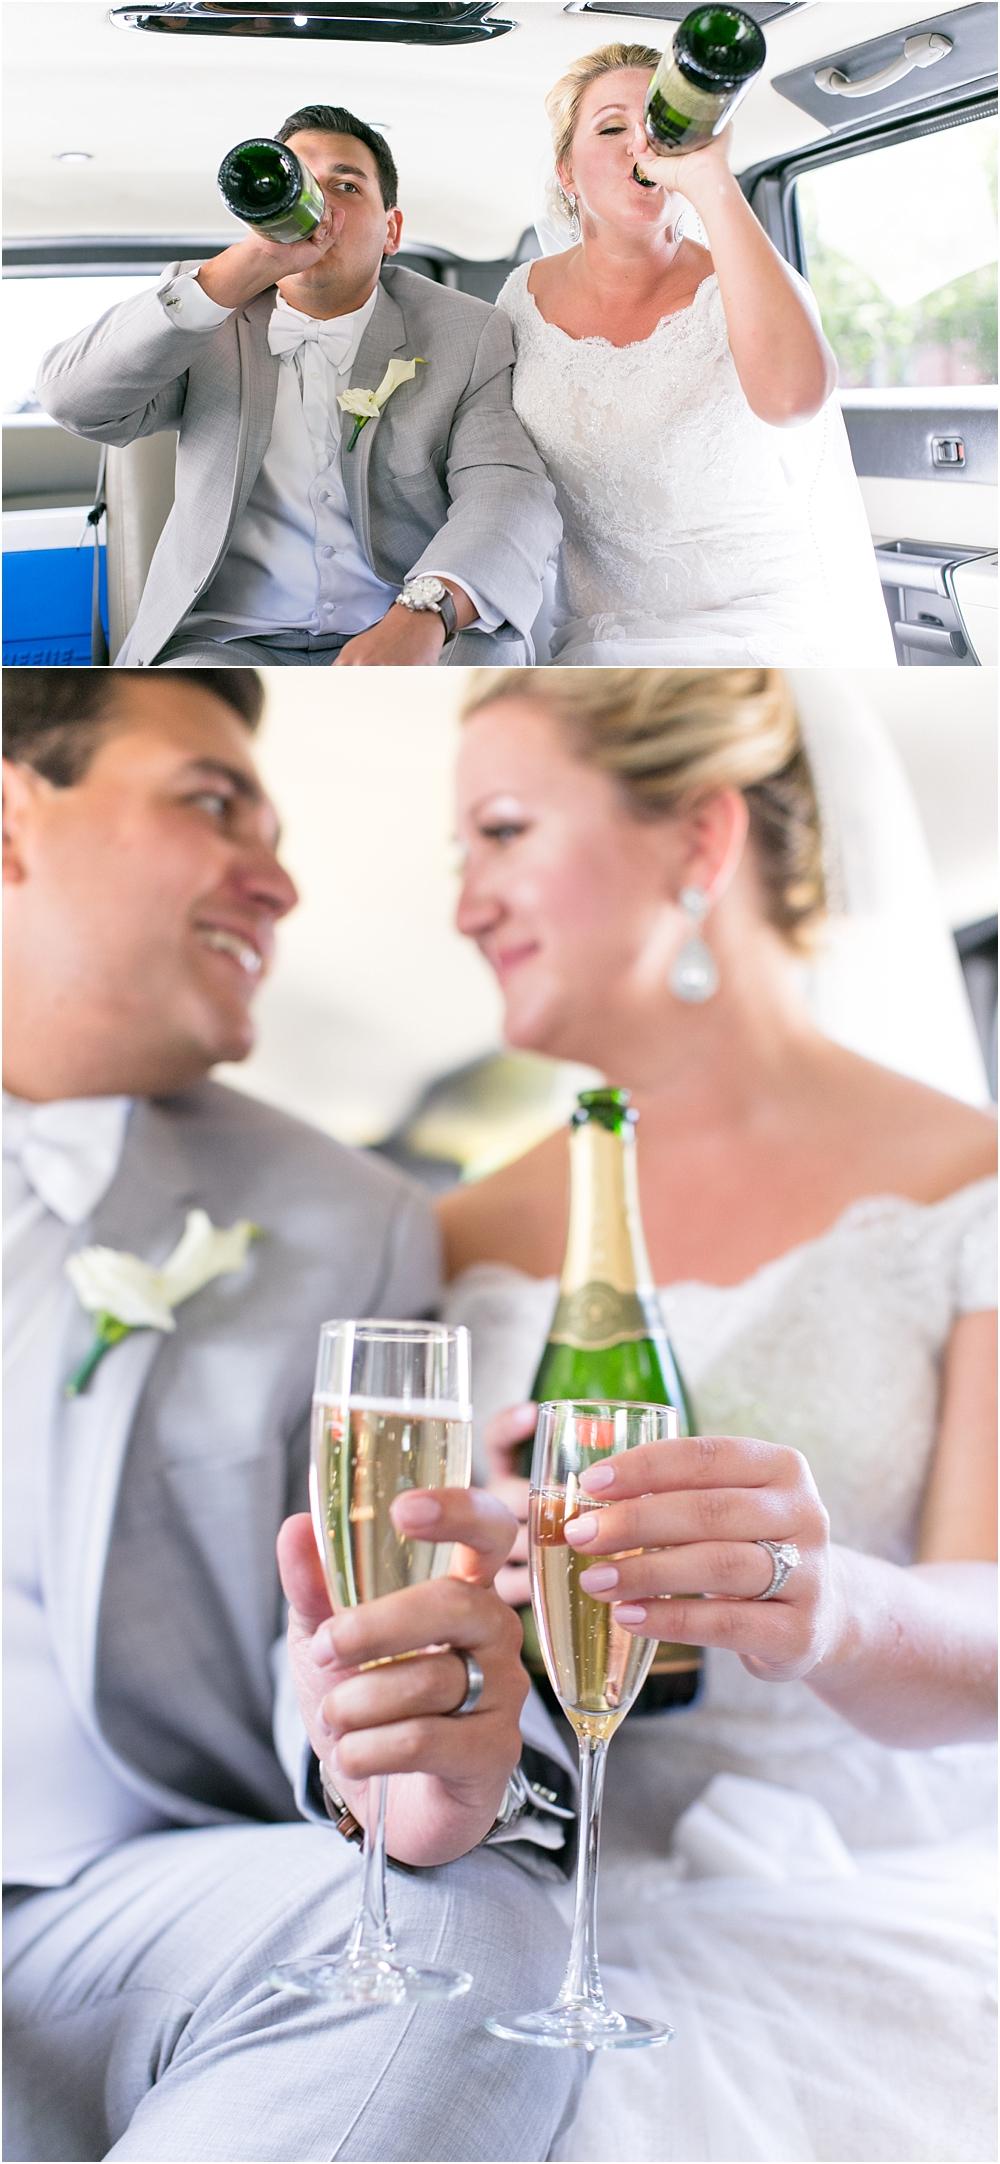 hidalgo wedding tabrizis waterfront weddings living radiant photography photos_0043.jpg